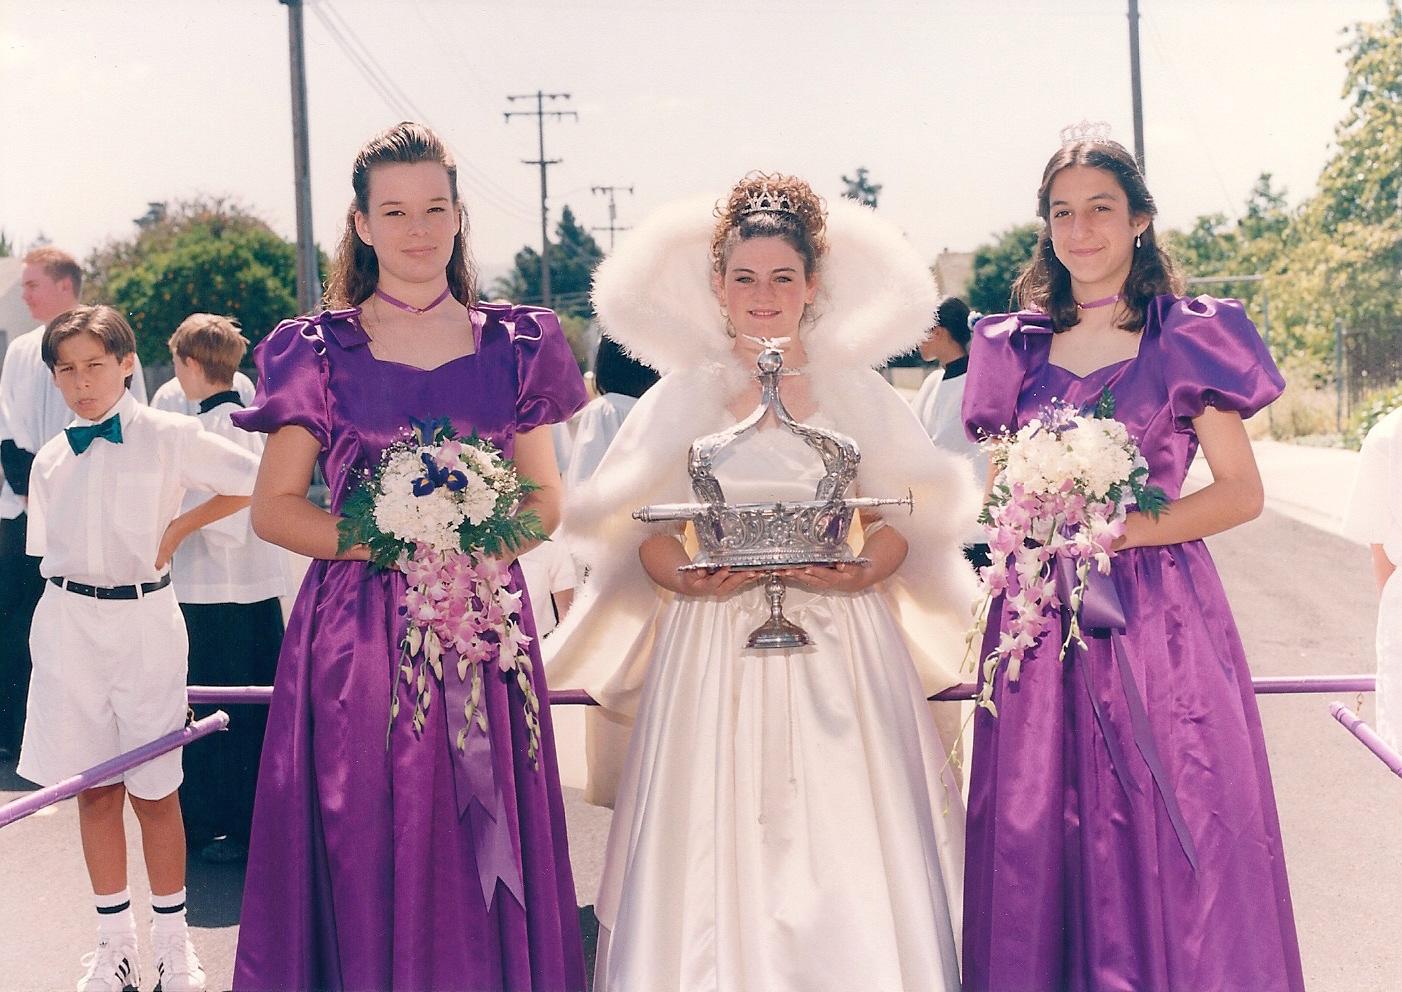 1995 Festival Queen -  Kristina Strambi    Sidemaids - Kelli Cantlon Walden & Amanda Monteiro Lingle